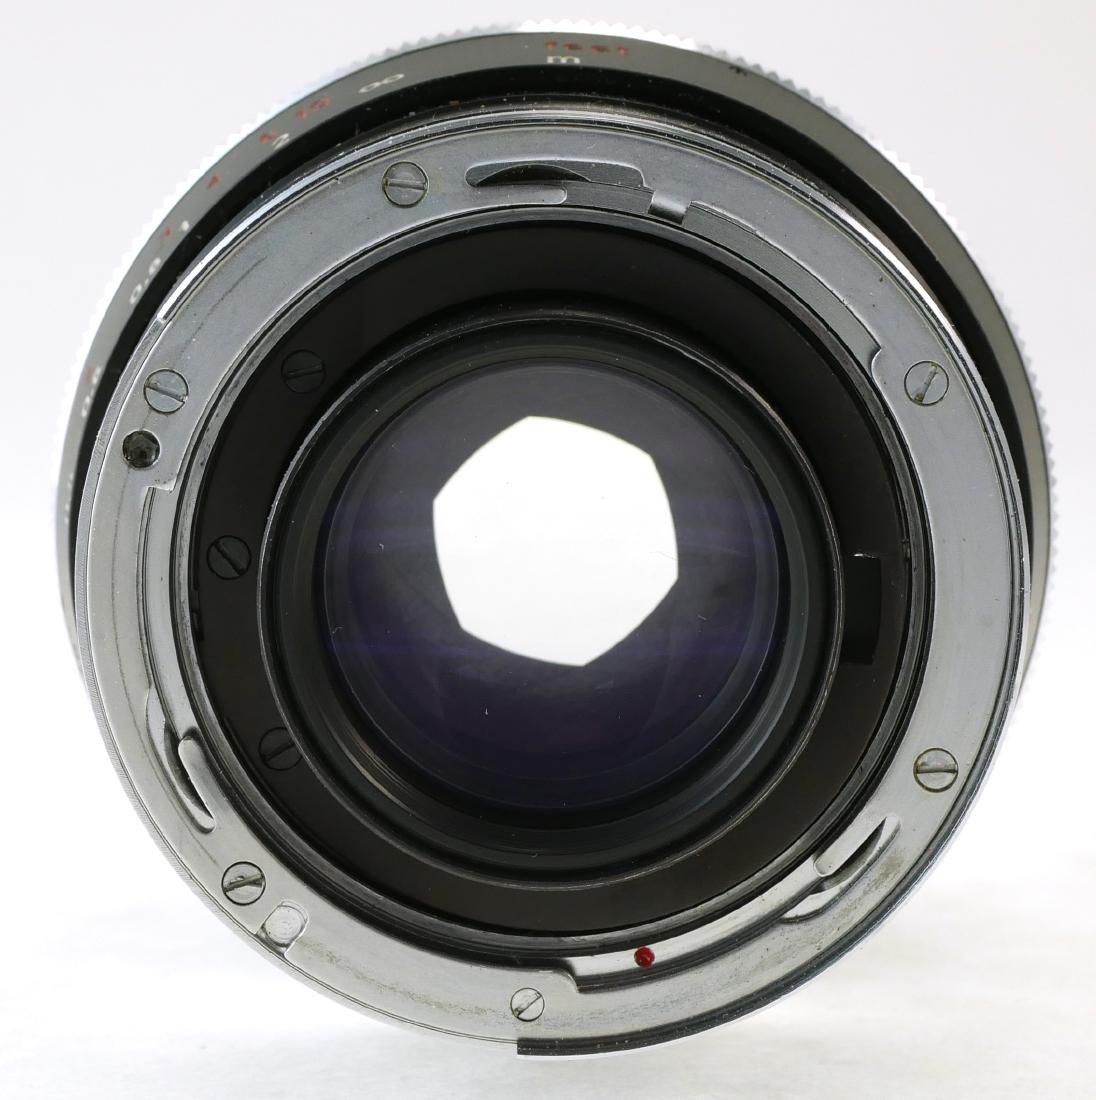 2 Carl Zeiss Lenses, Tessar & Distagon - 8